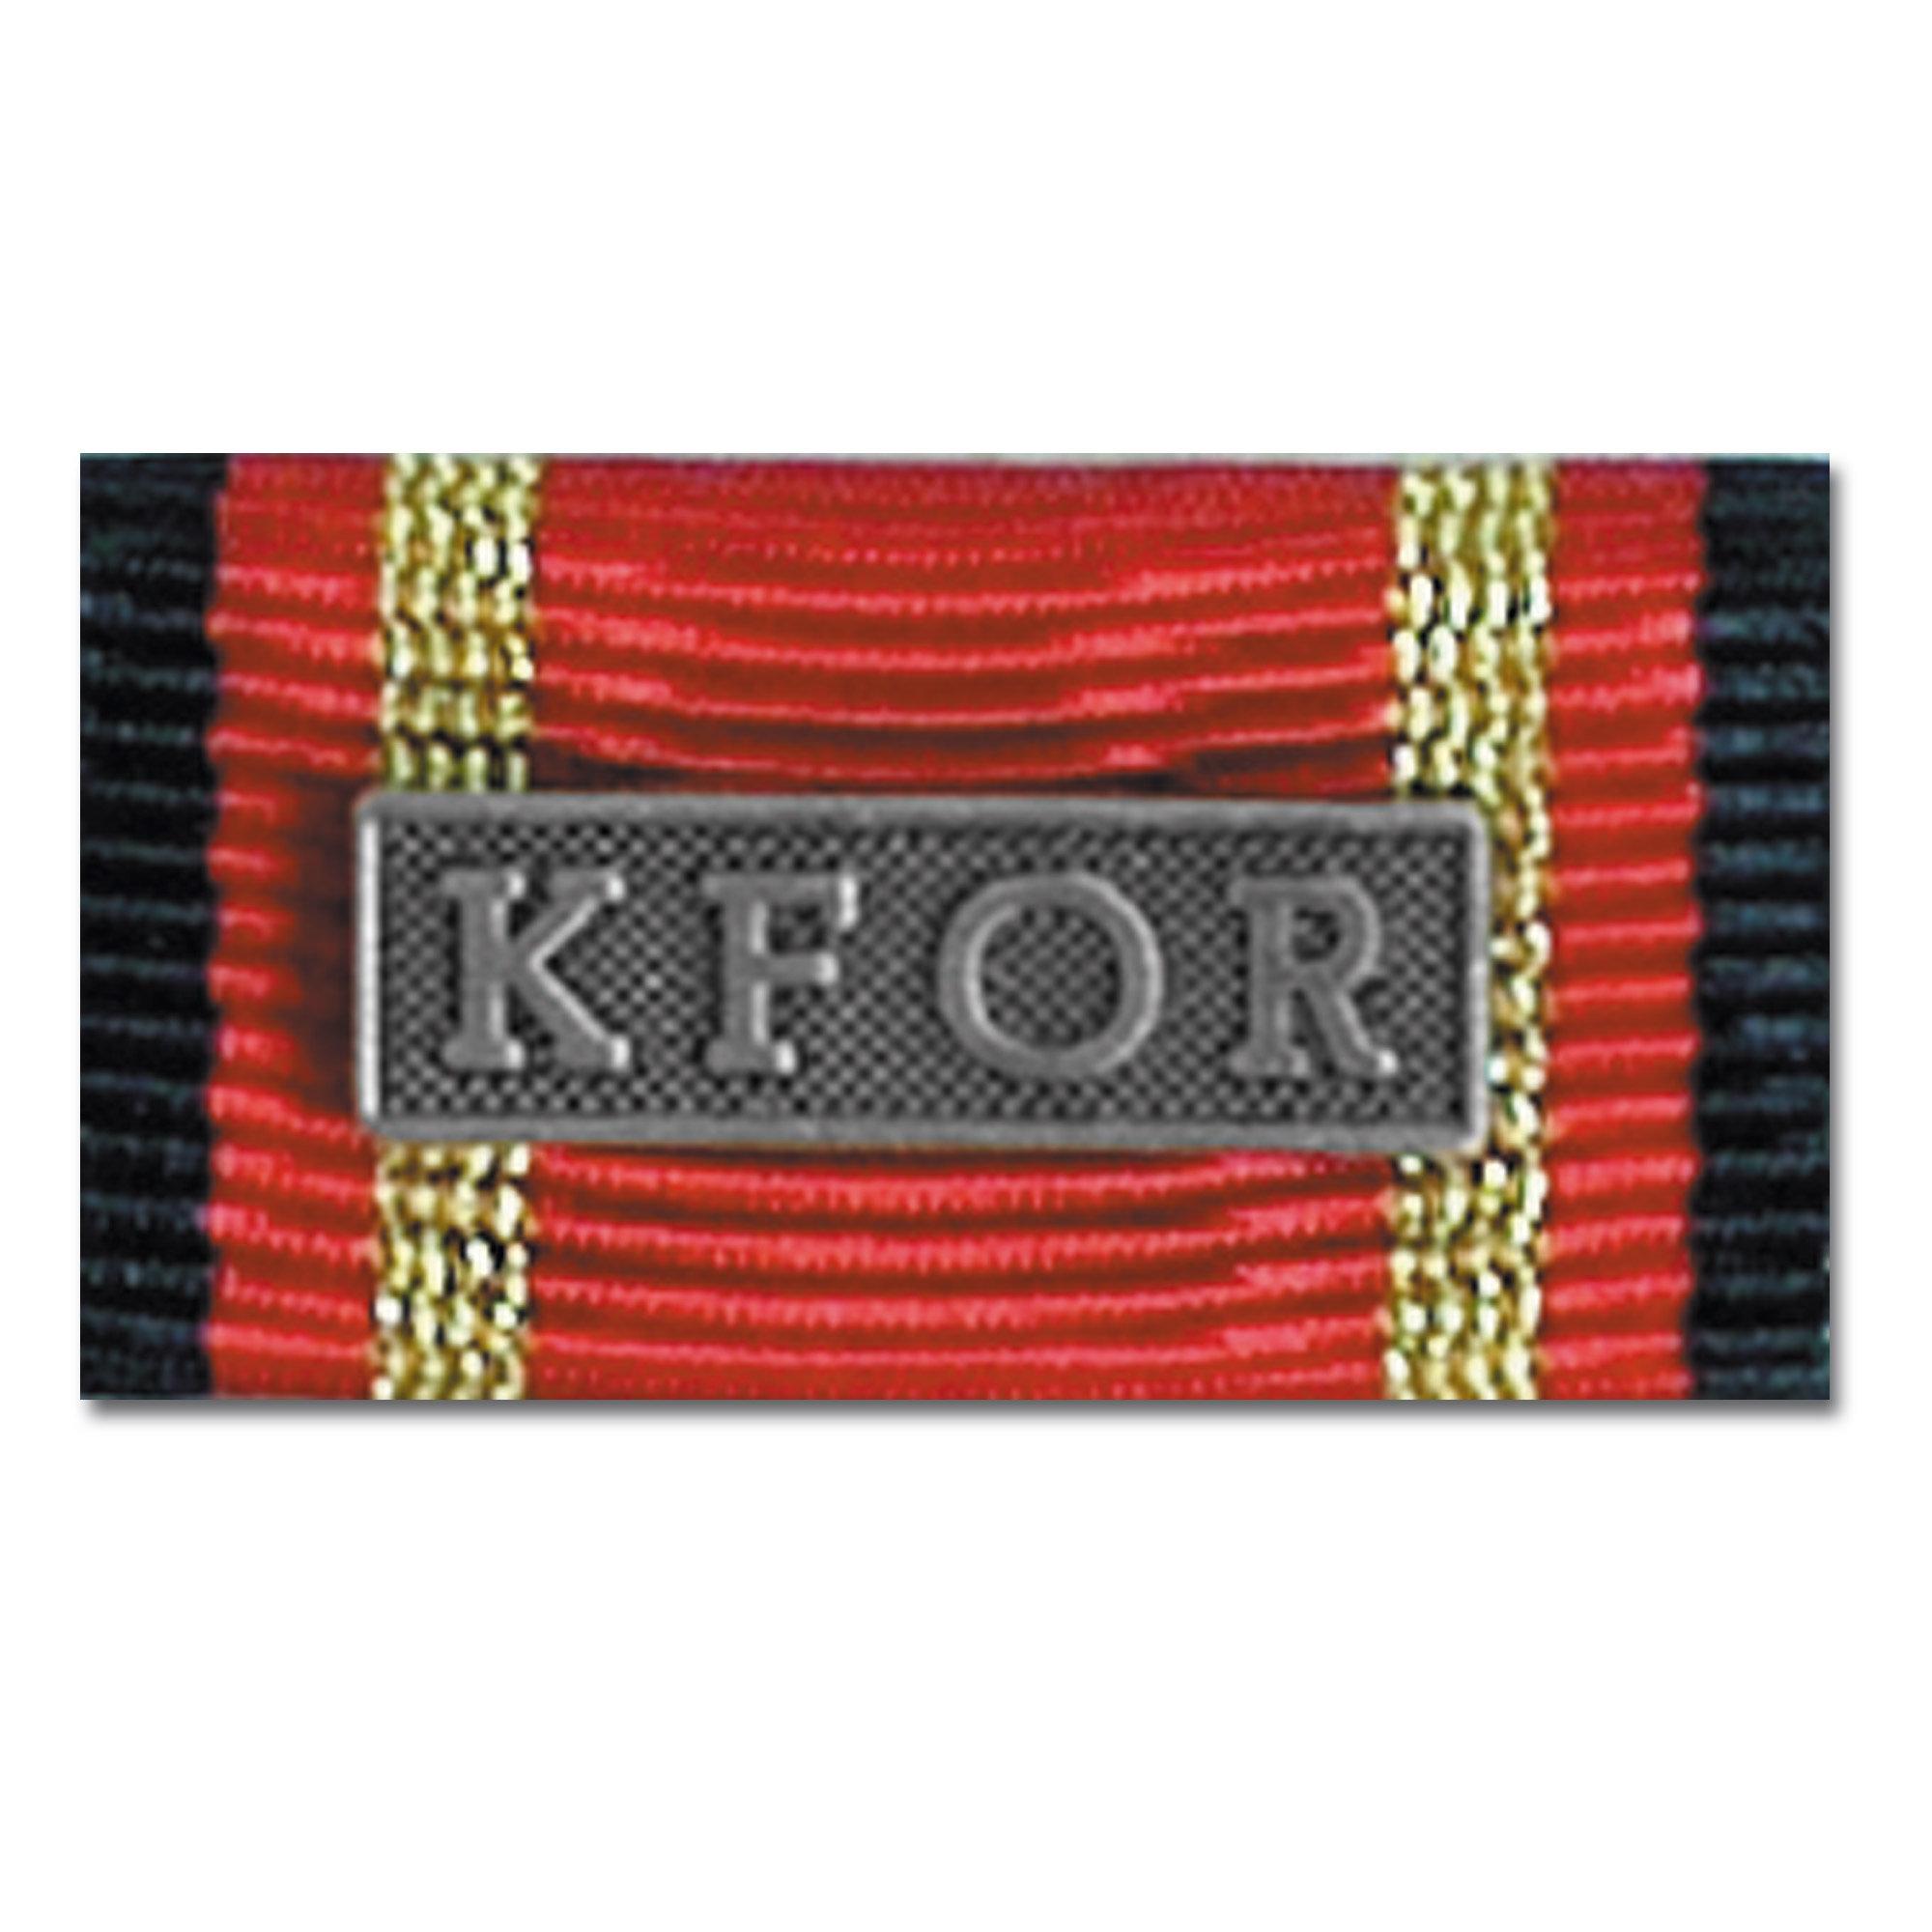 Medalla al servicio KFOR silber